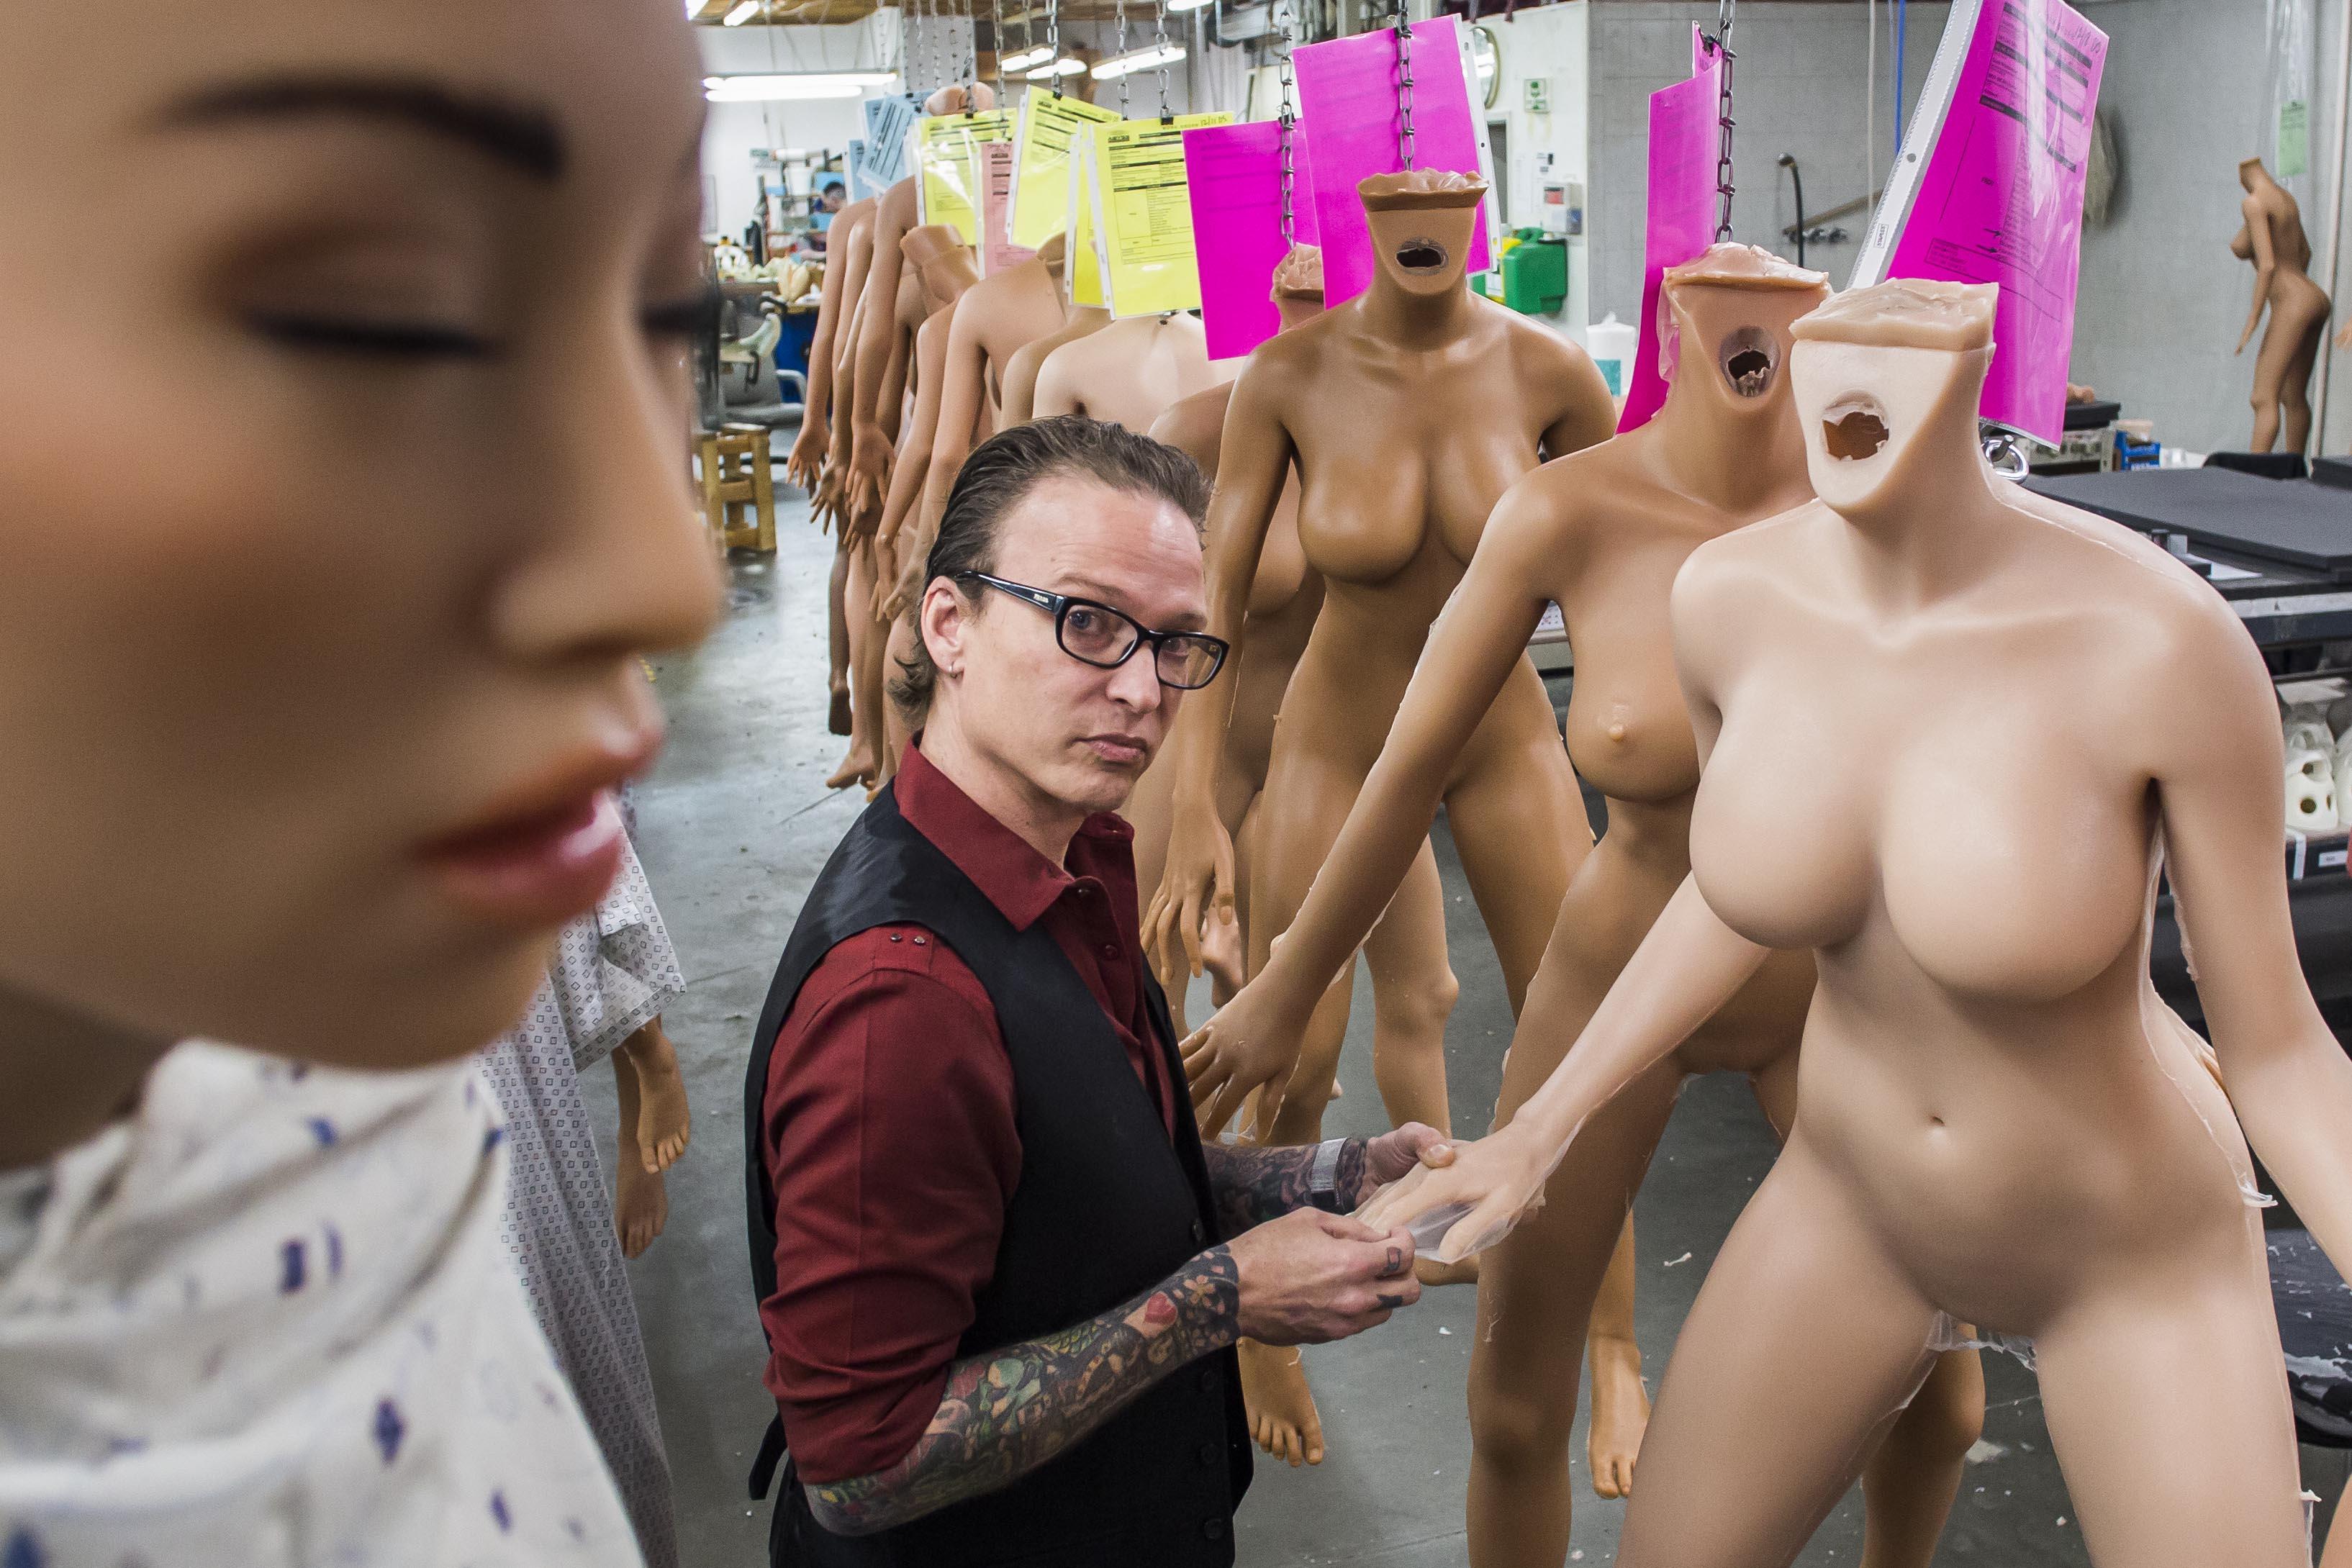 Matt McMullen, fundador de RealDoll, junto às bonecas em sua oficina de San Marcos.